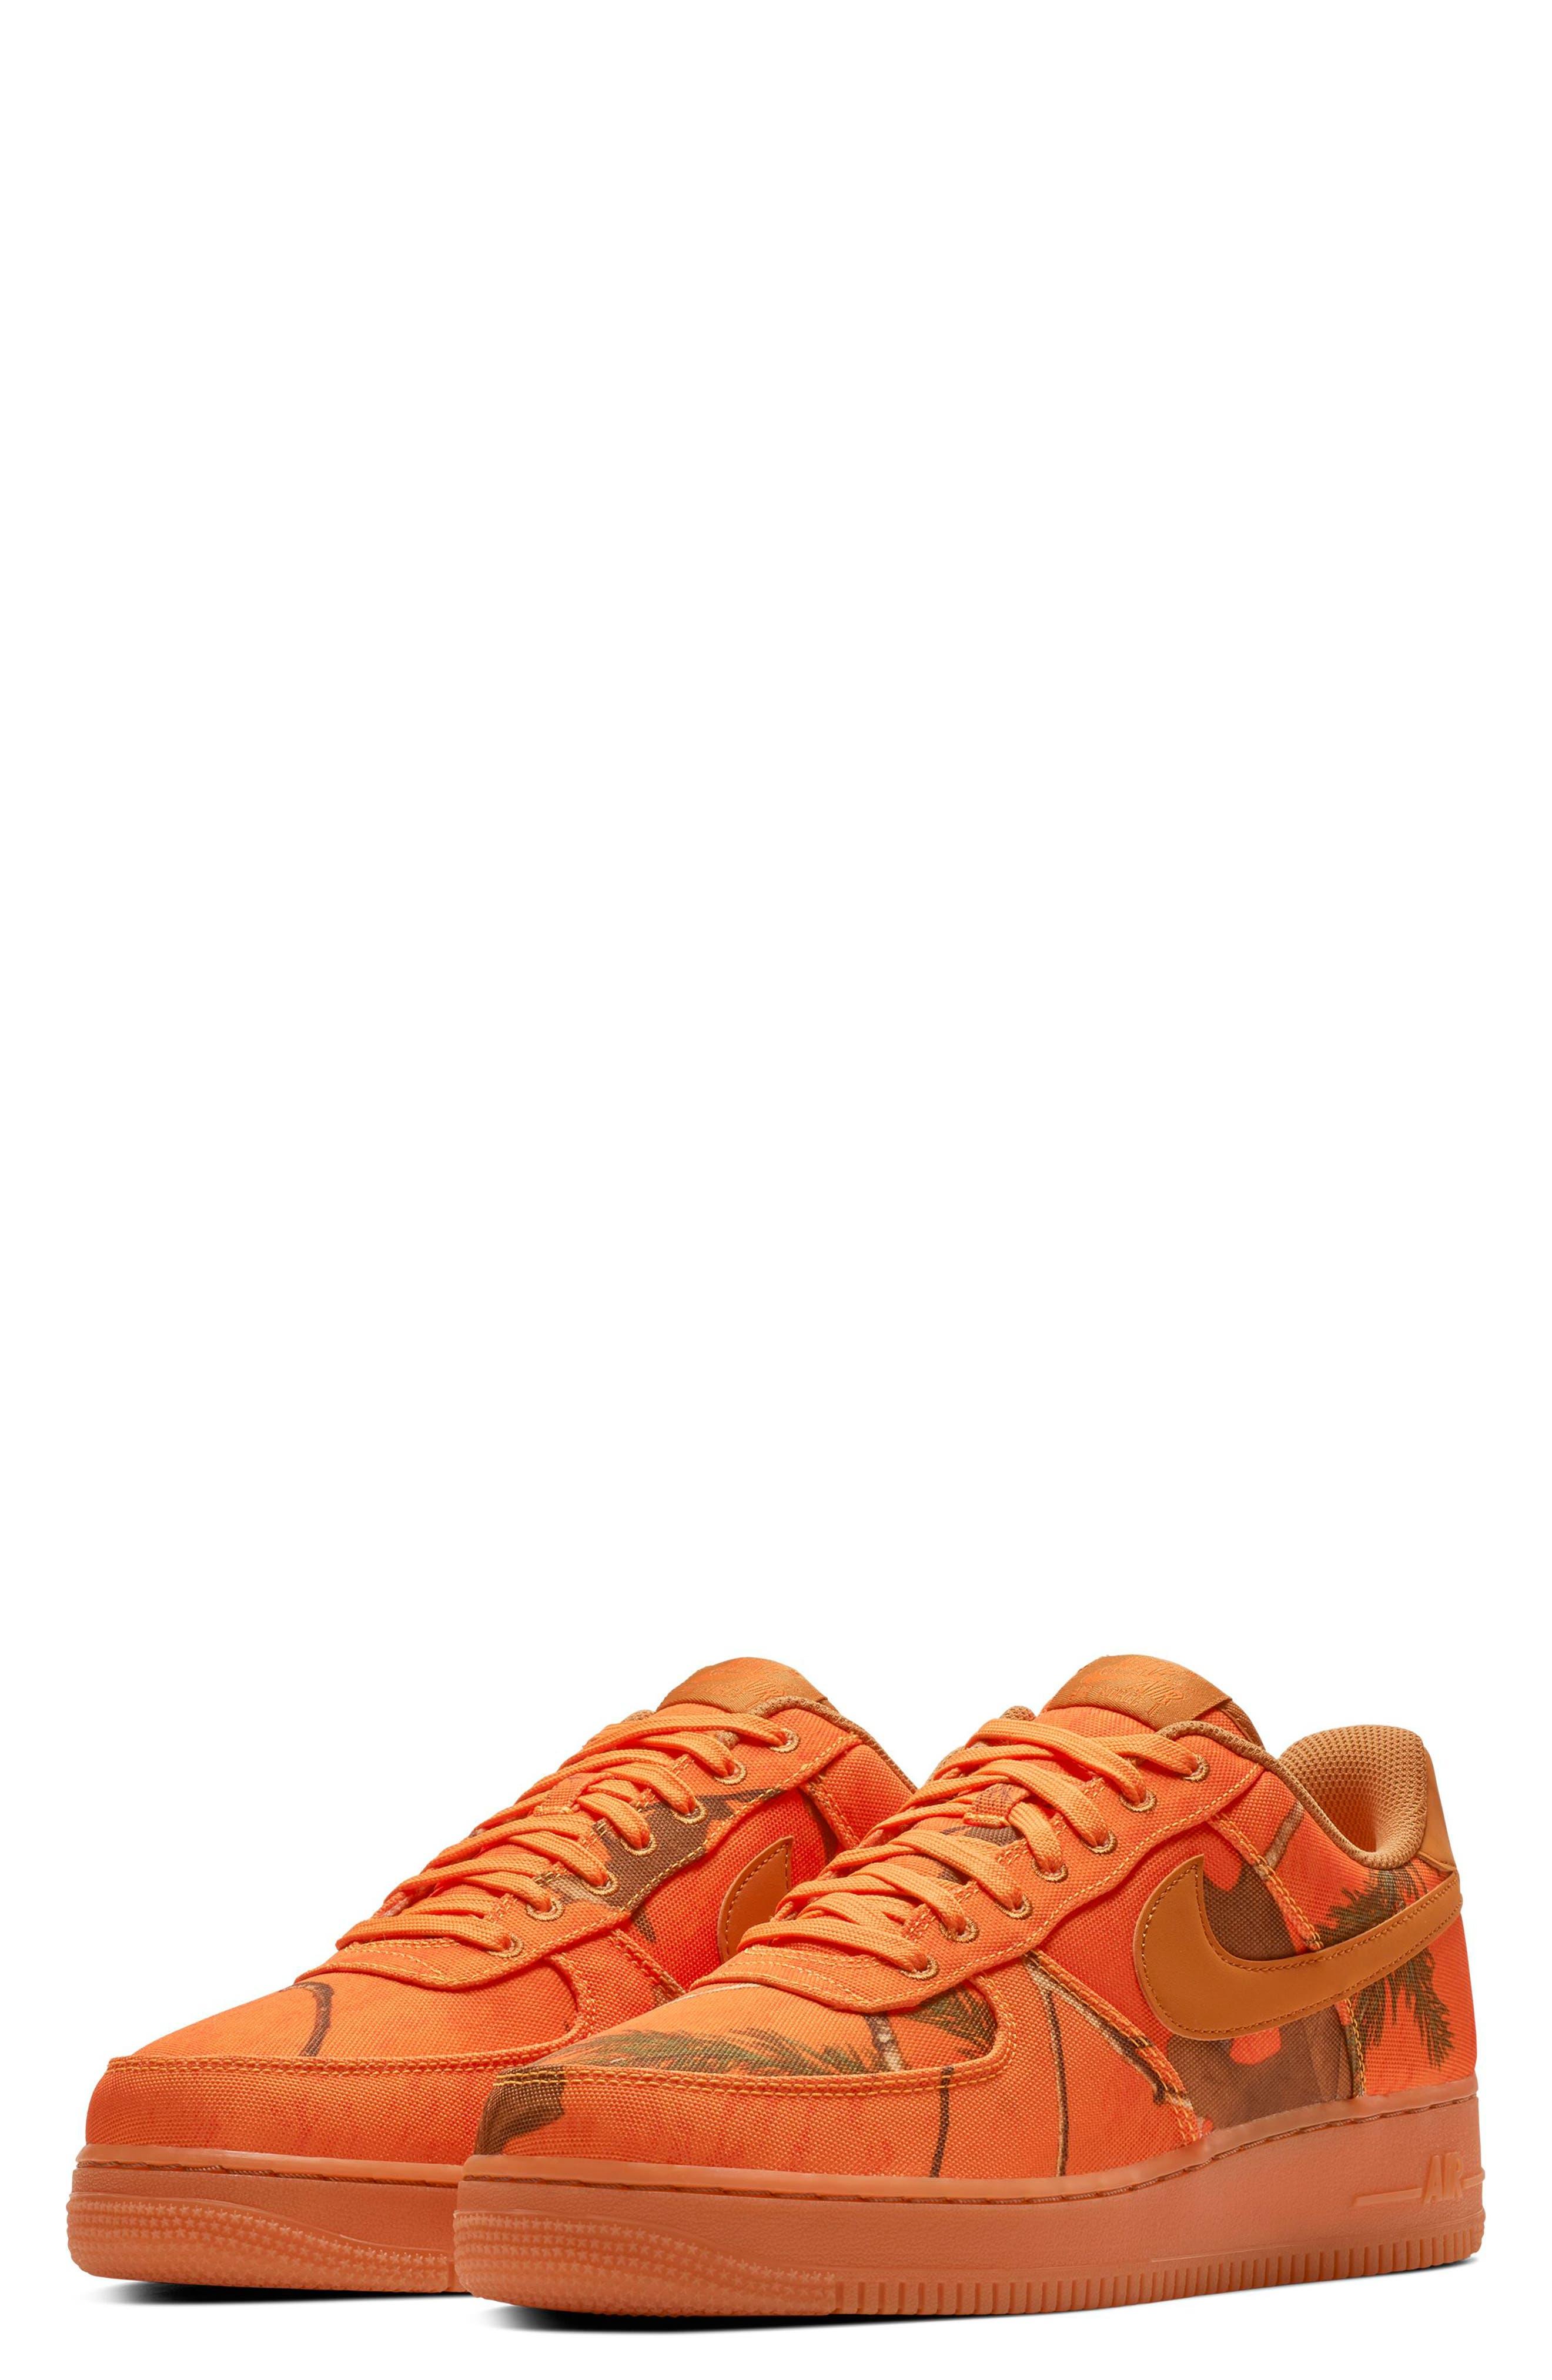 NIKE,                             Air Force 1 '07 LV8 3 Sneaker,                             Main thumbnail 1, color,                             ORANGE BLAZE/ WHITE/ BROWN